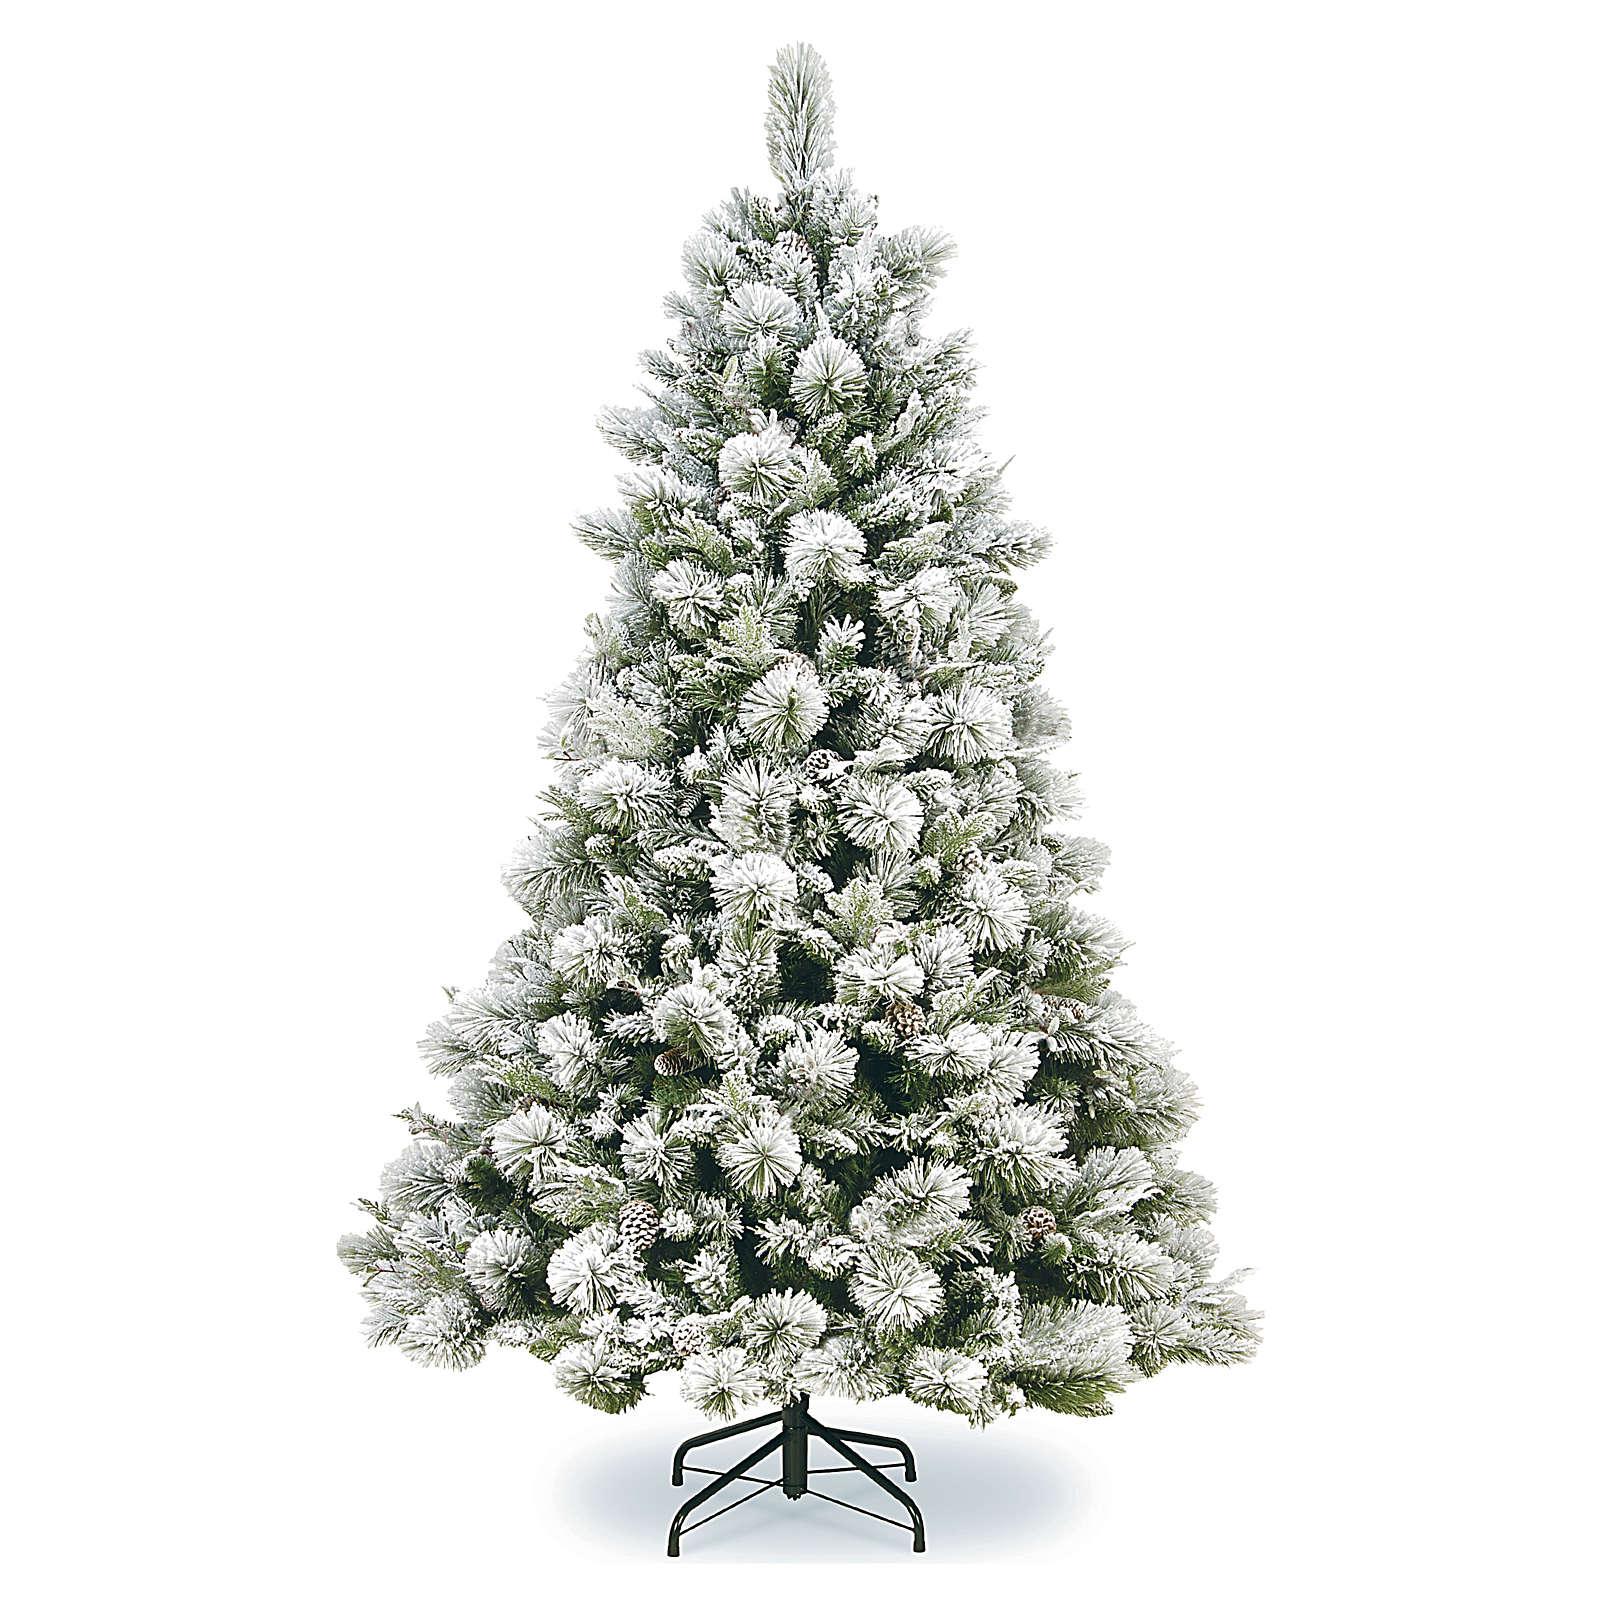 Sapin de Noël 210 cm pommes pin enneigé Bedford 3